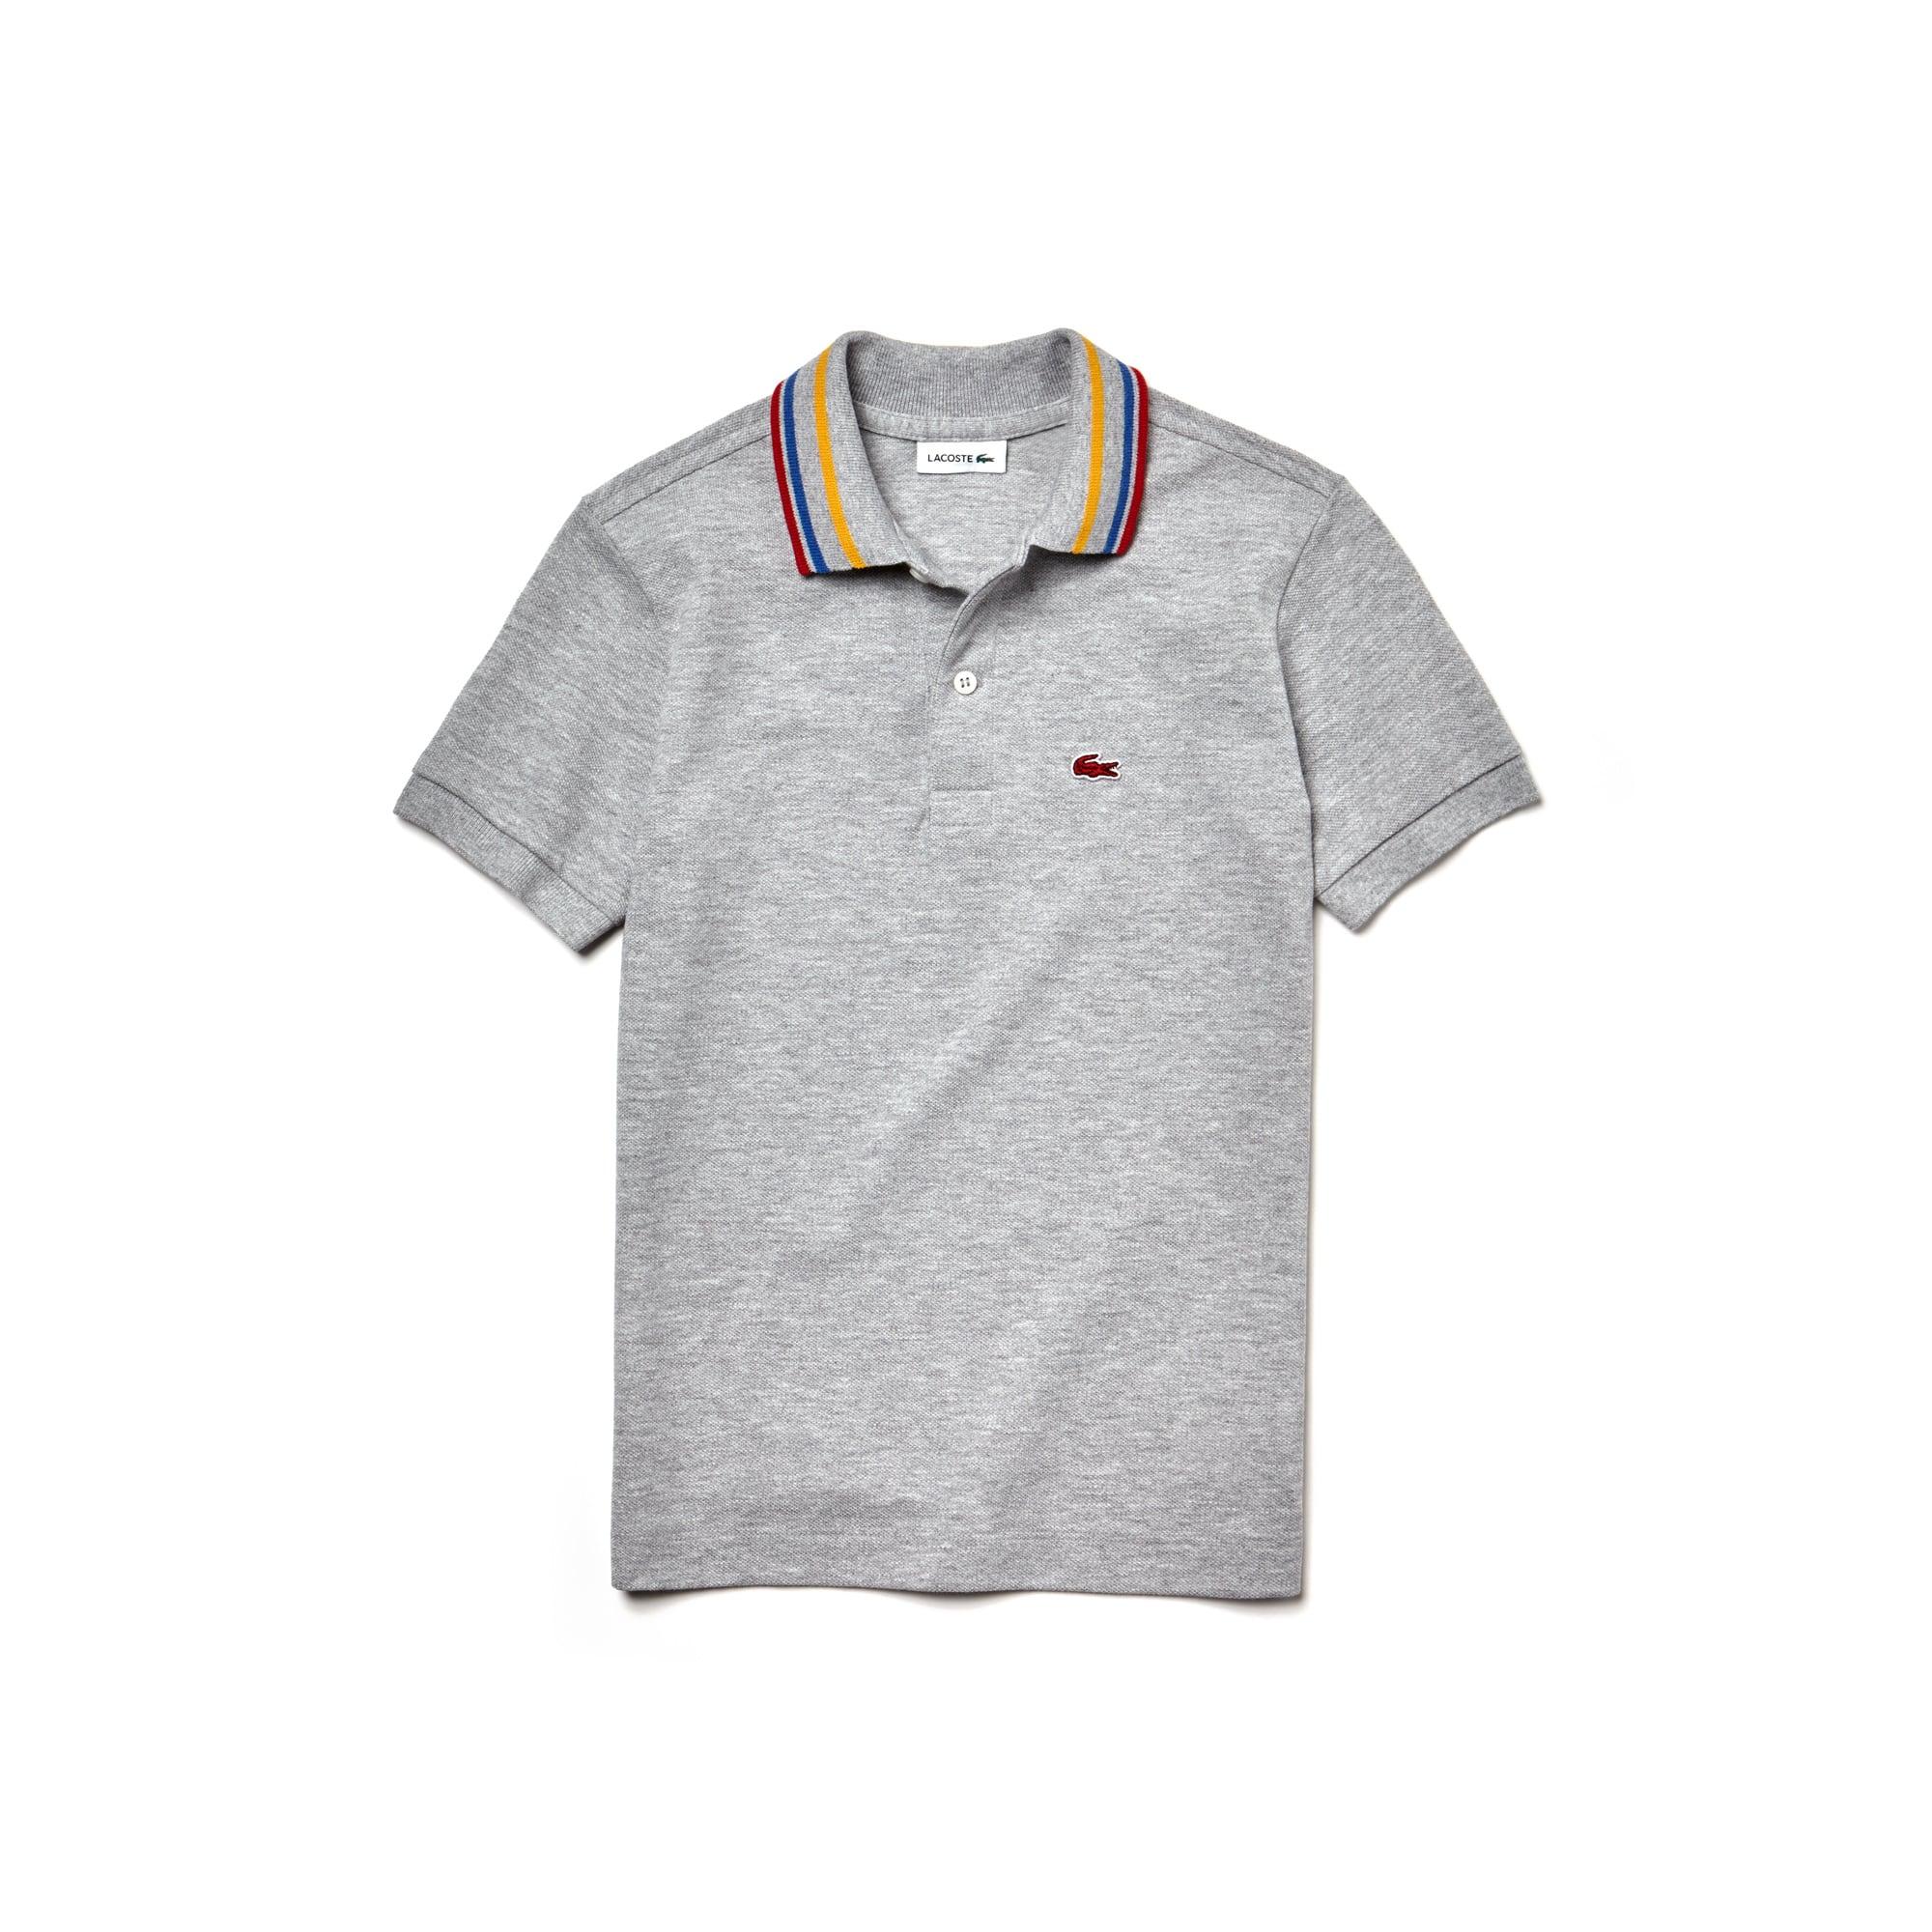 0018b7e81 Boys  Lacoste Striped Neck Petit Piqué Polo Shirt